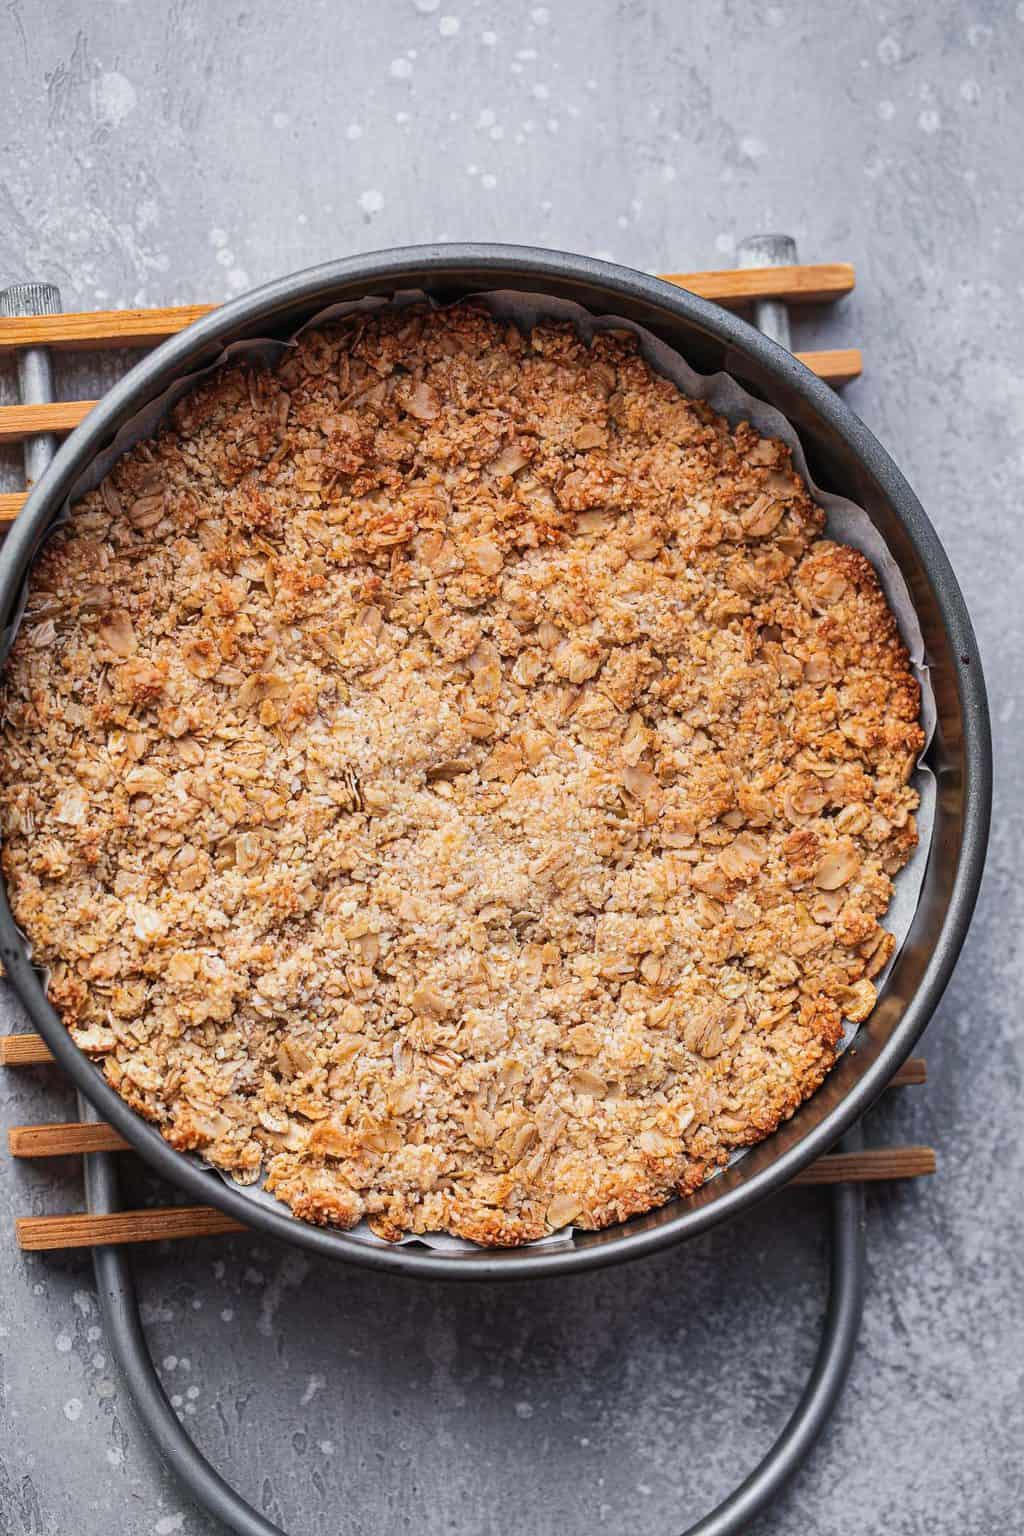 Vegan sweet pie crust after baking